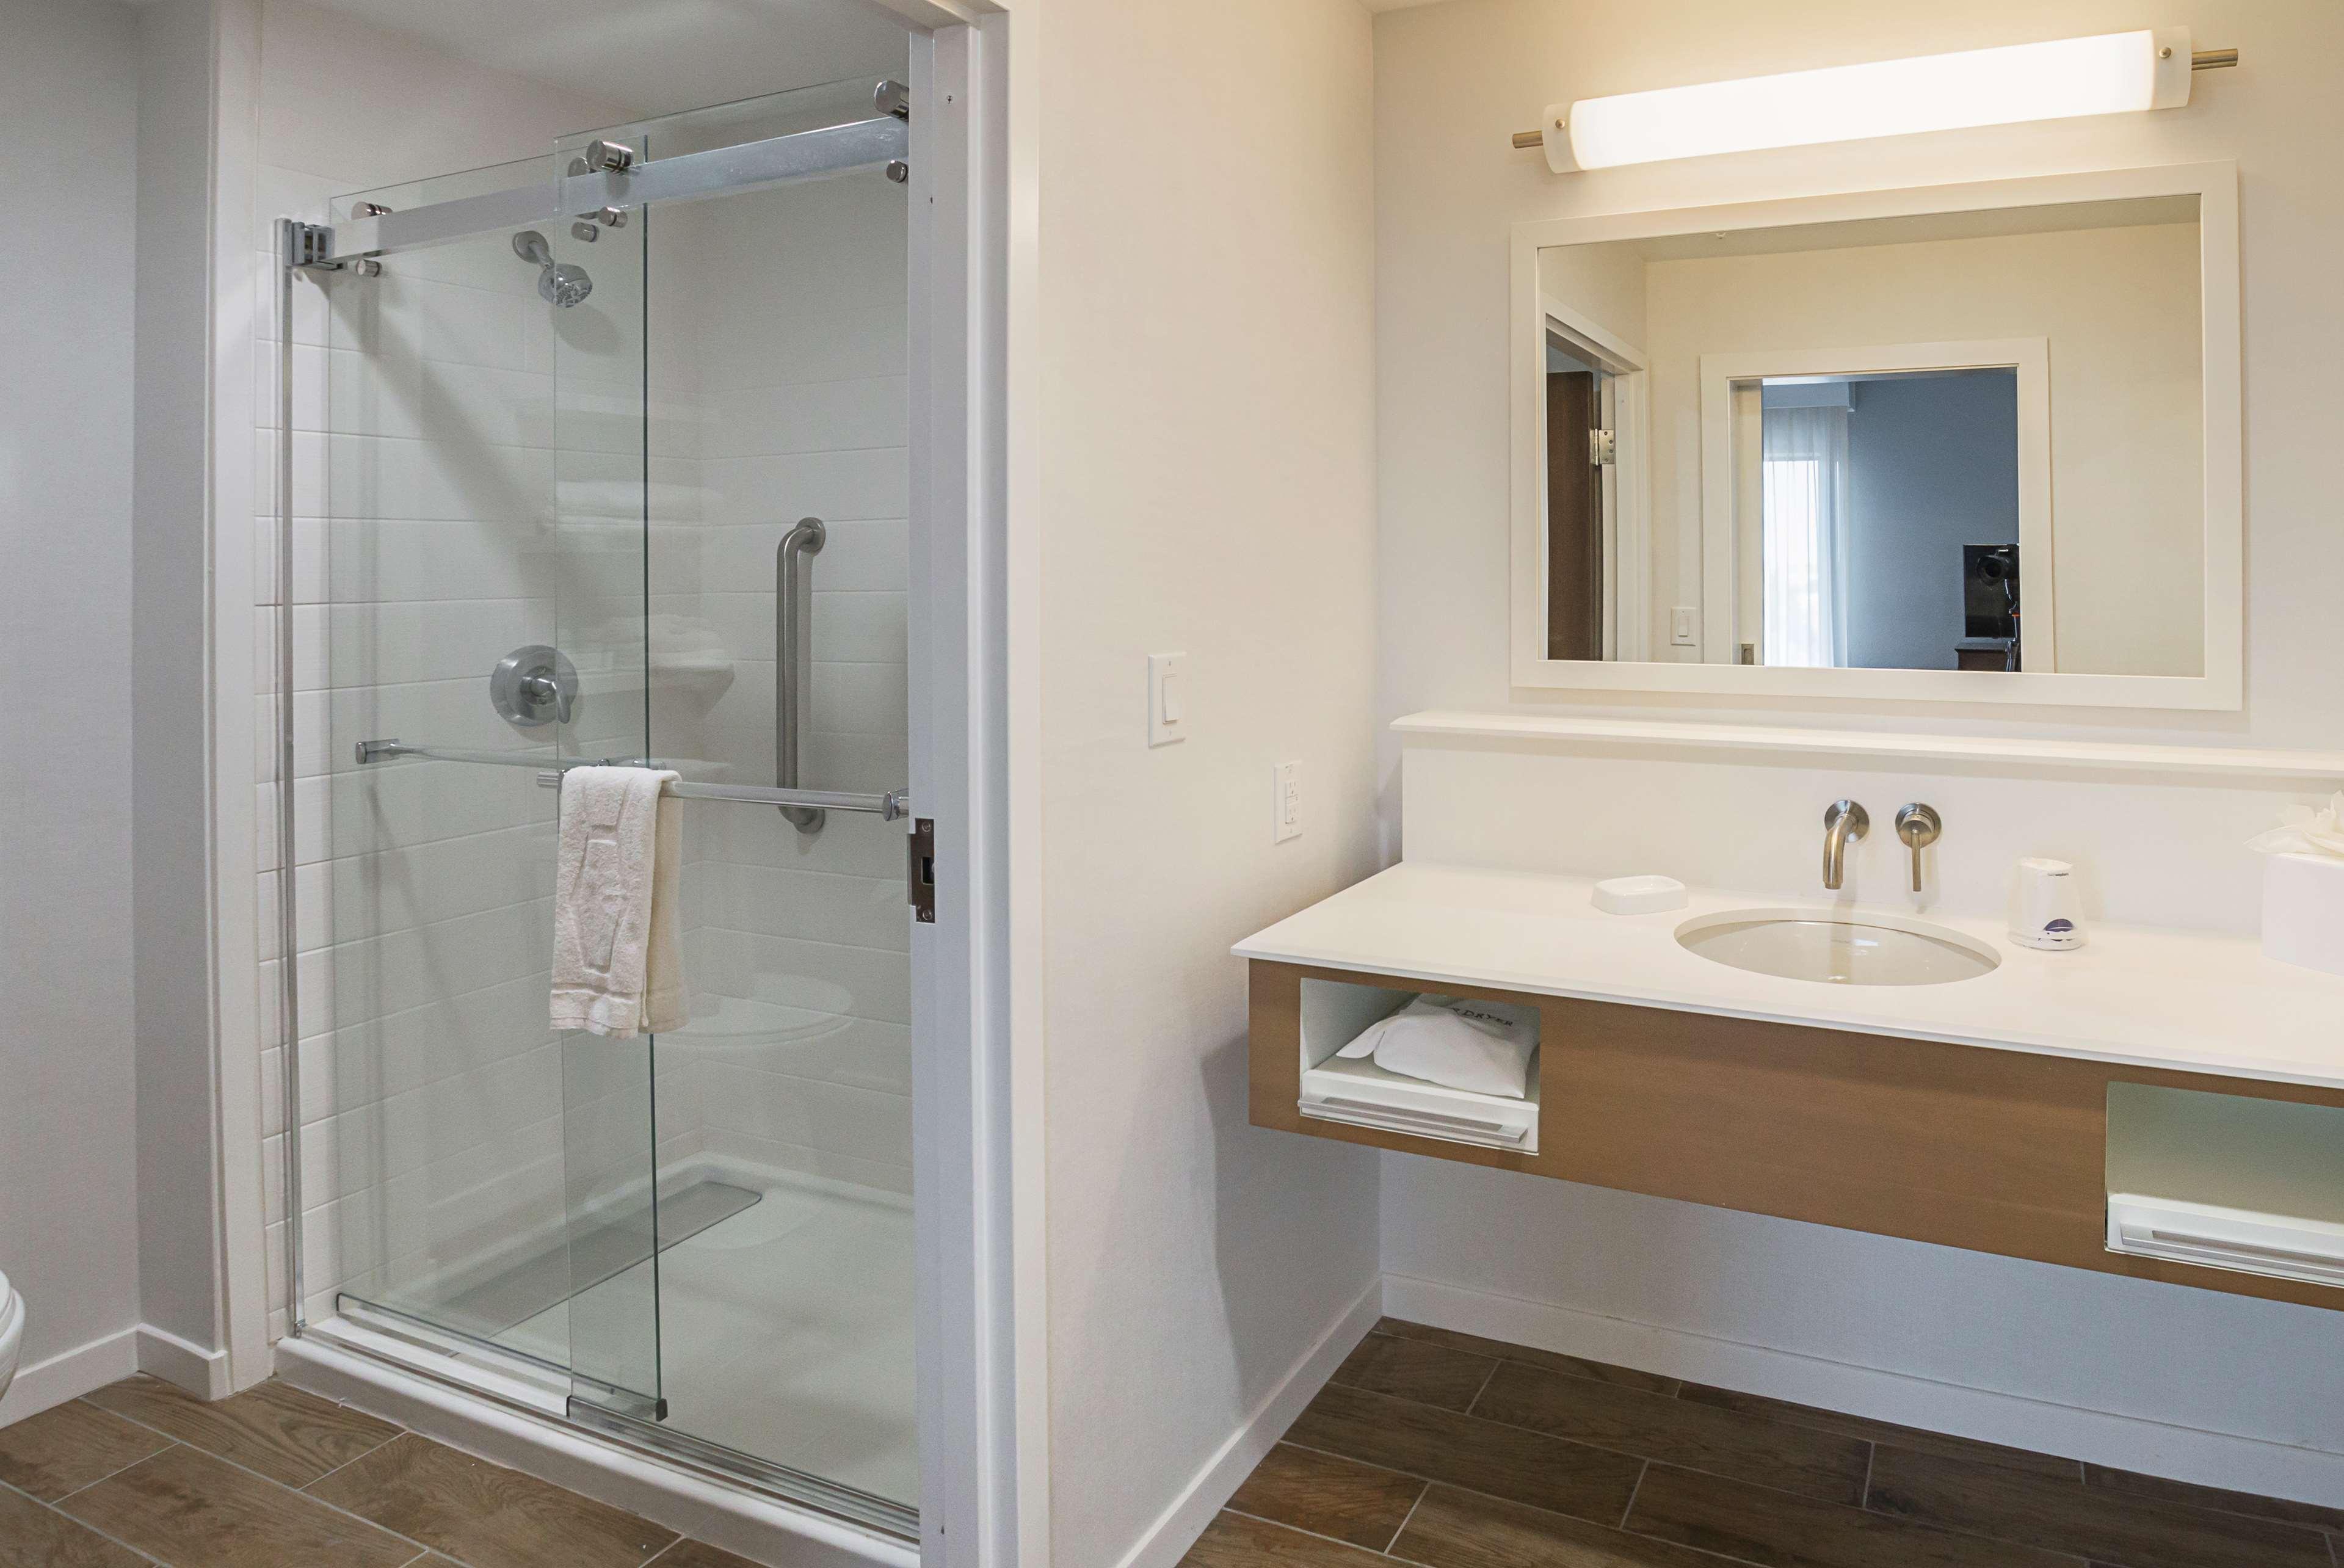 Hampton Inn & Suites Colleyville DFW West image 45